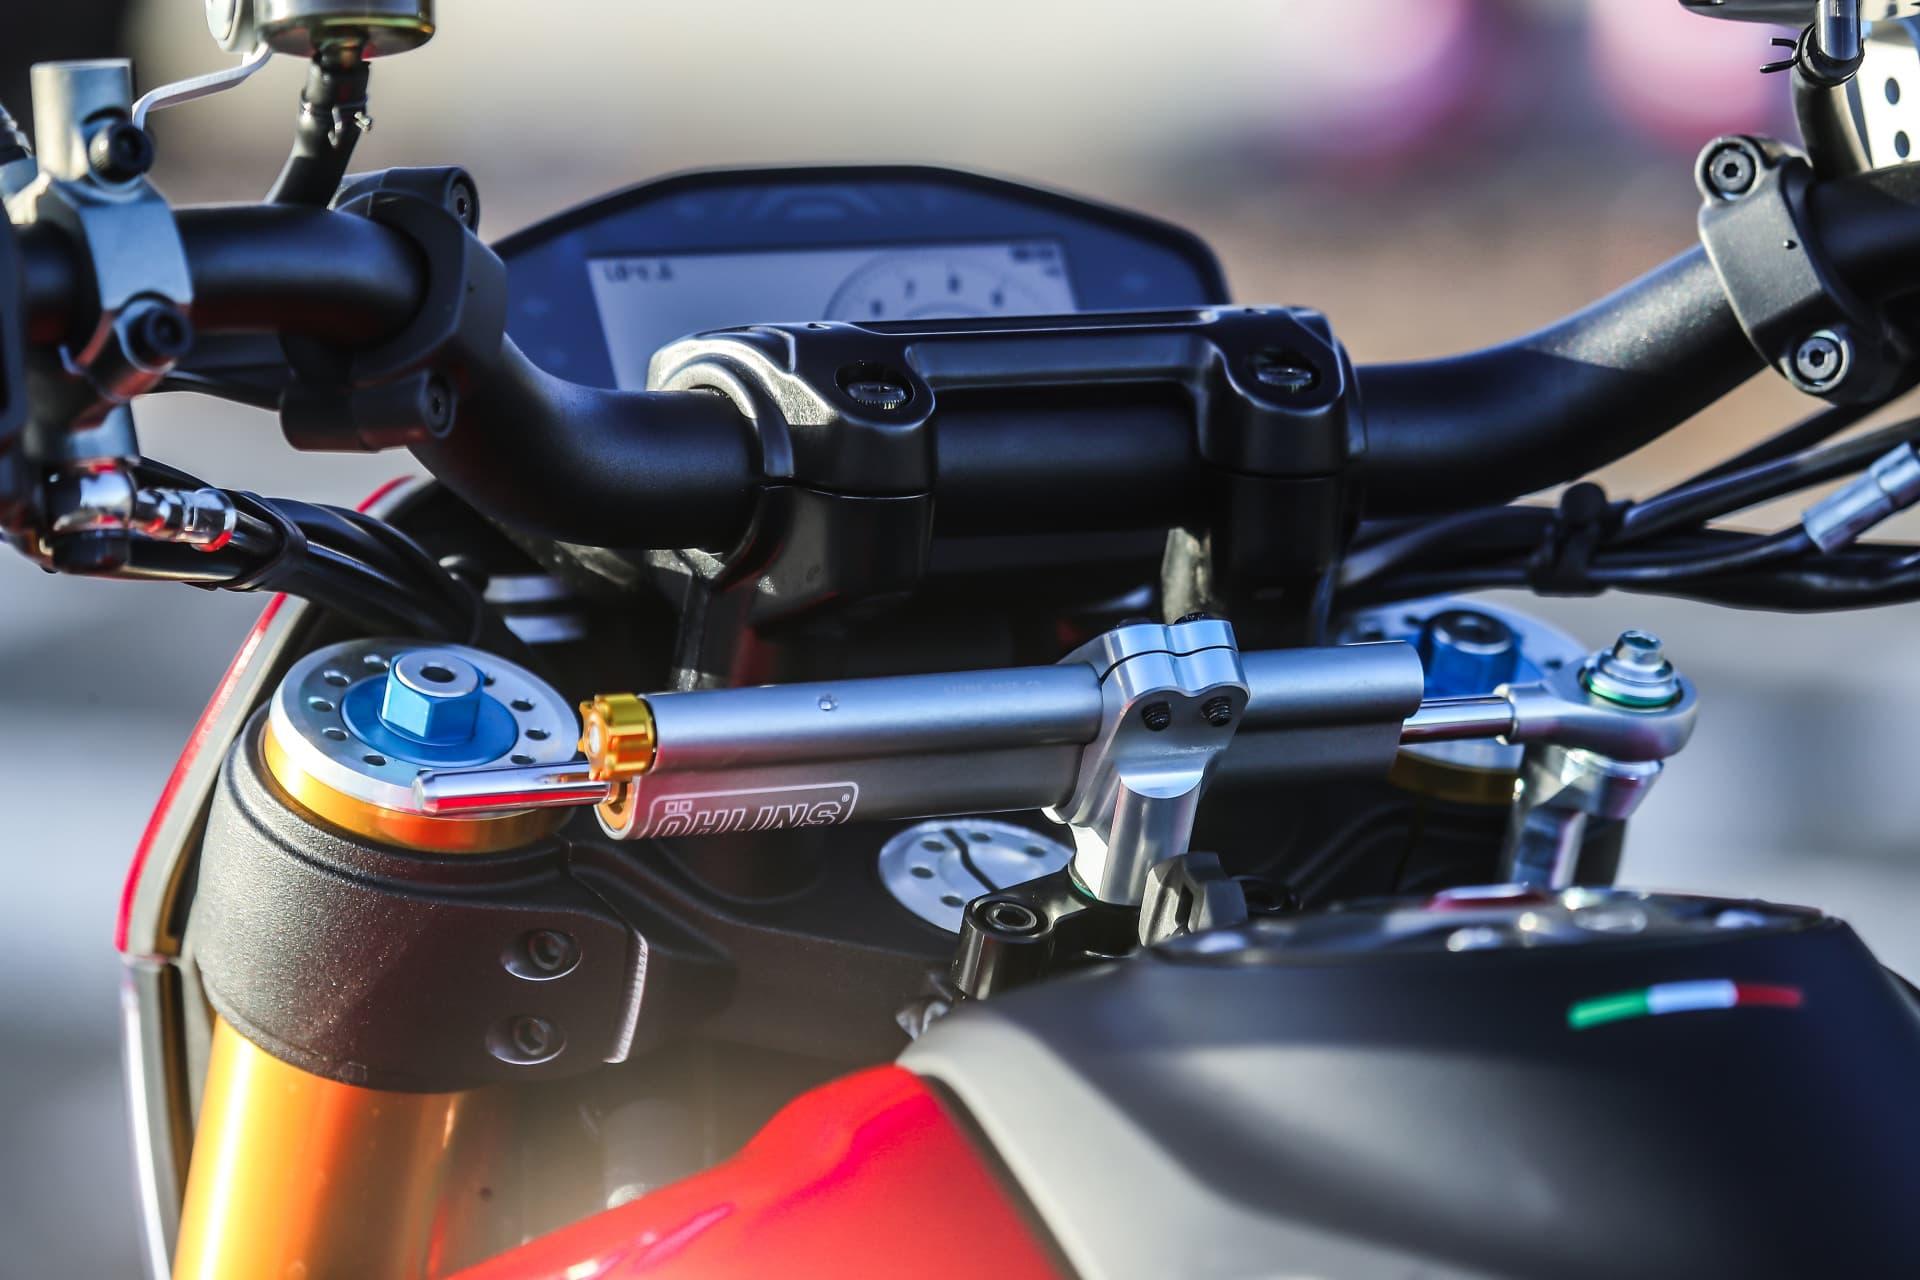 Ducati Hypermotard 950 Sp Static 34 Uc70291 Mid